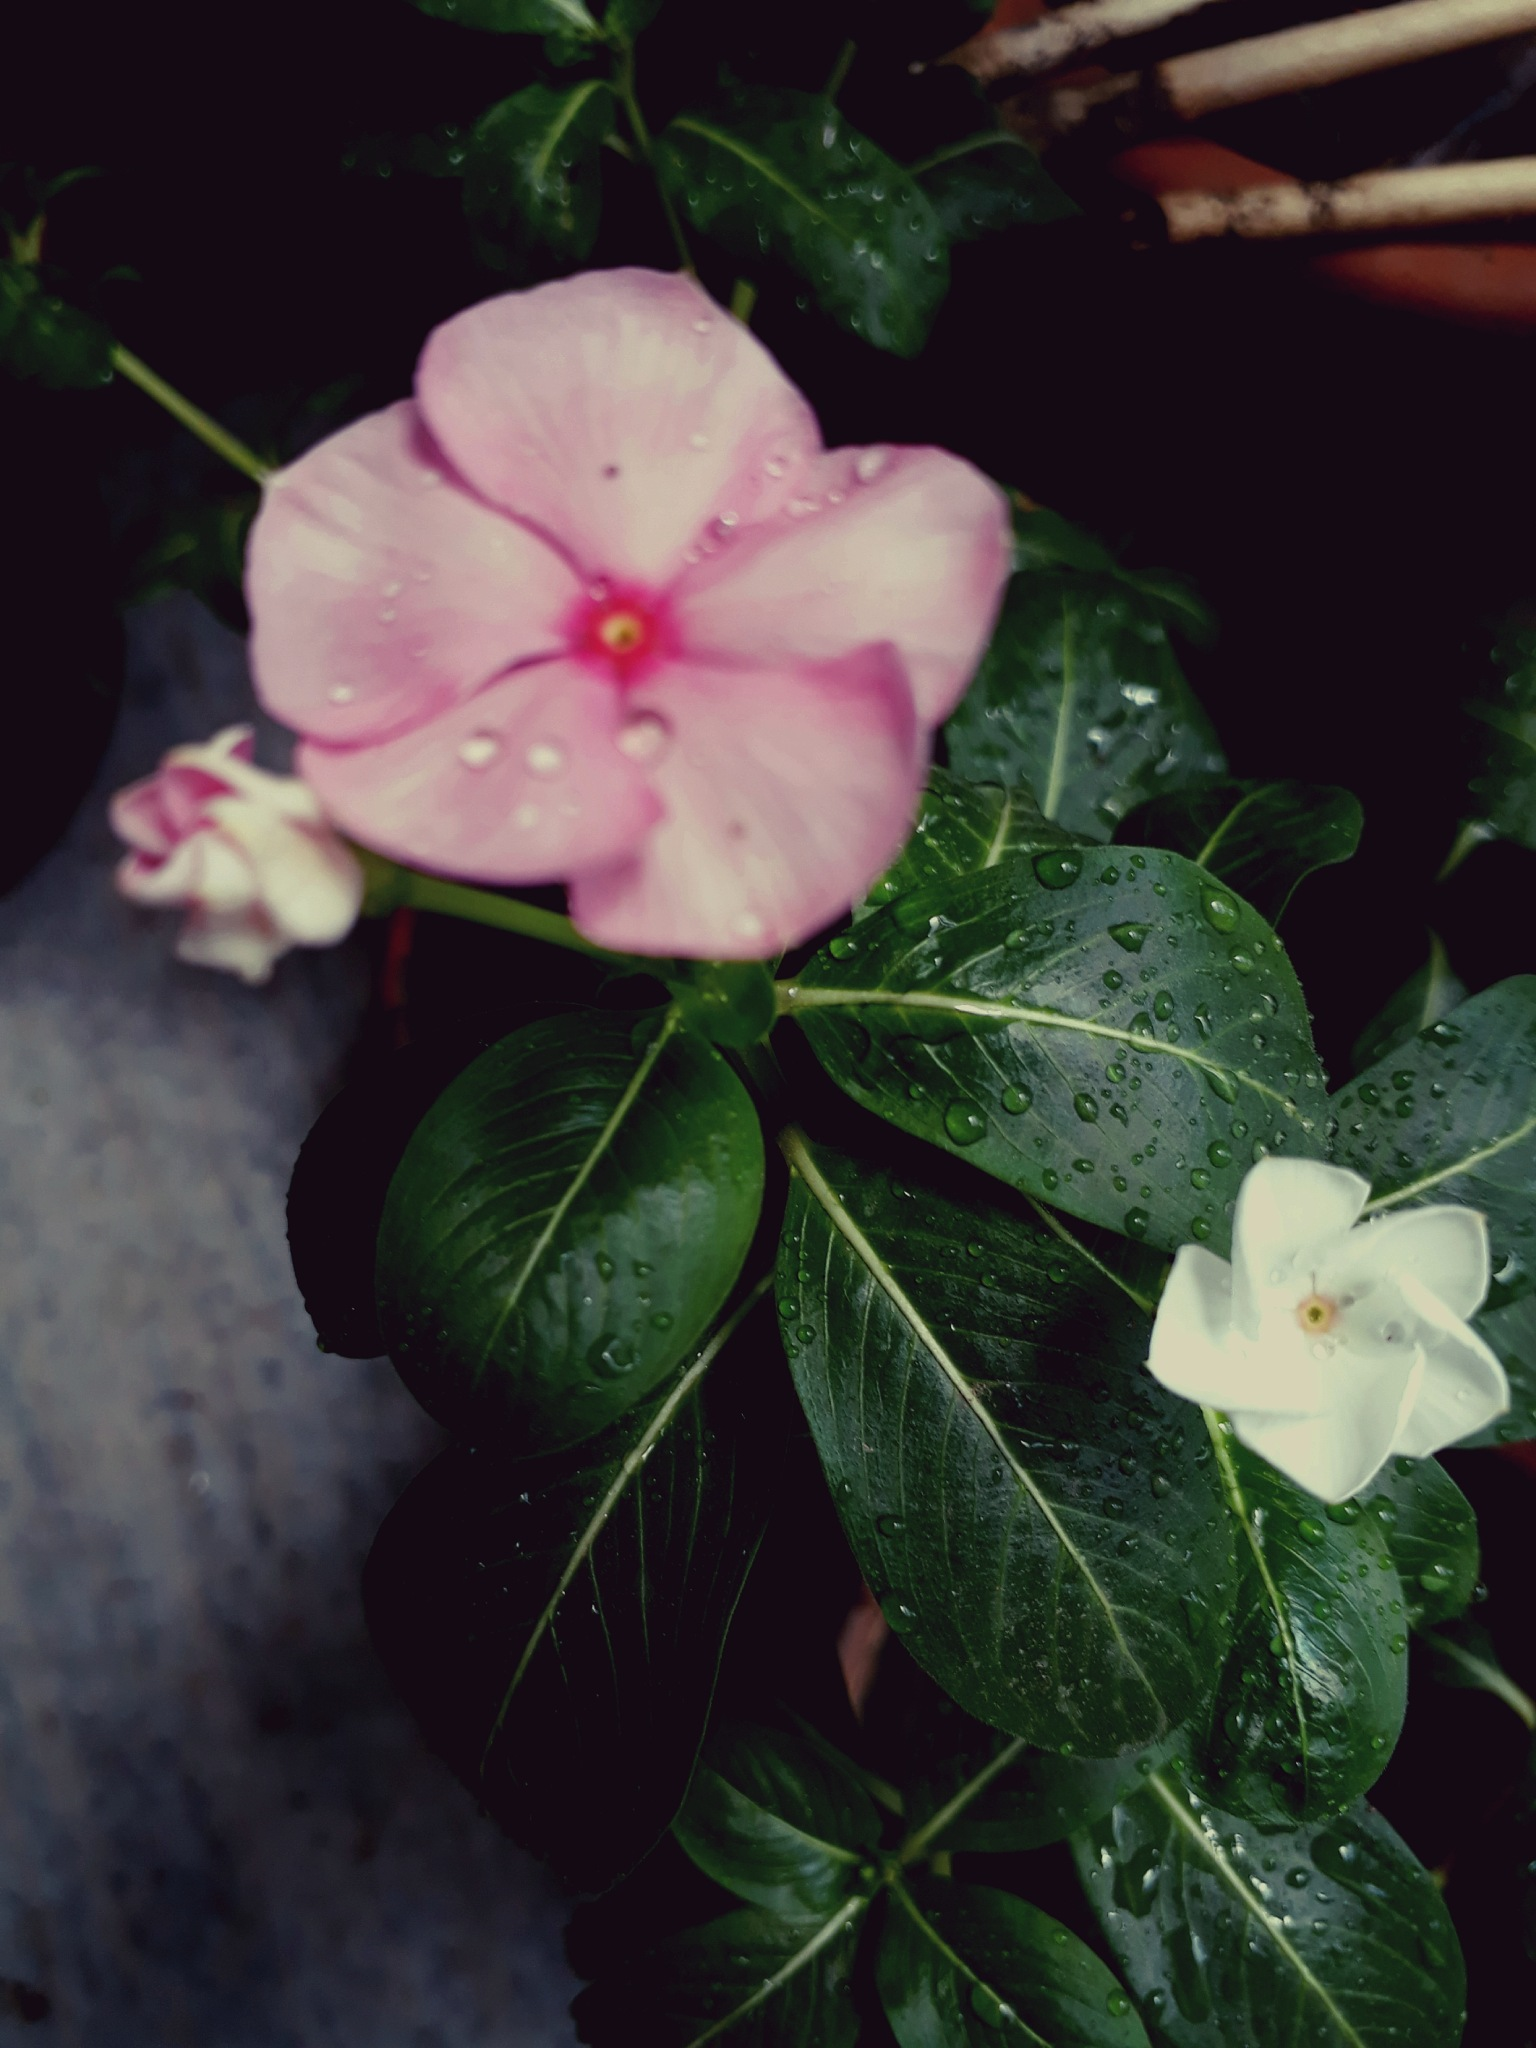 Bloom by Joydeep Pal